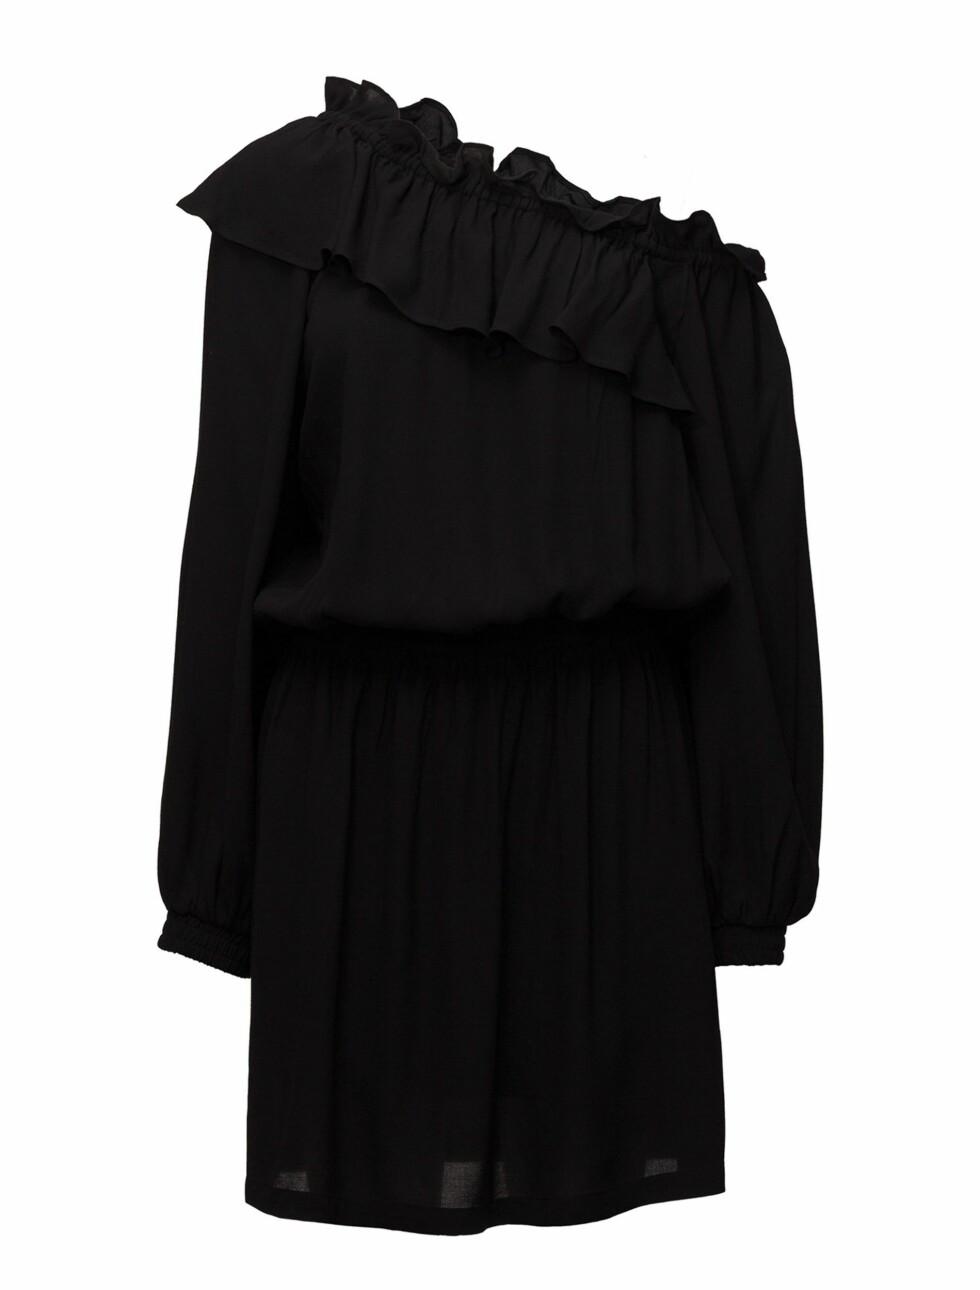 Kjole fra Designers Remix  1320,-  https://www.boozt.com/no/no/designers-remix/kate-shoulder-dress_16641109/16641125?navId=67453&group=listing&position=1000000